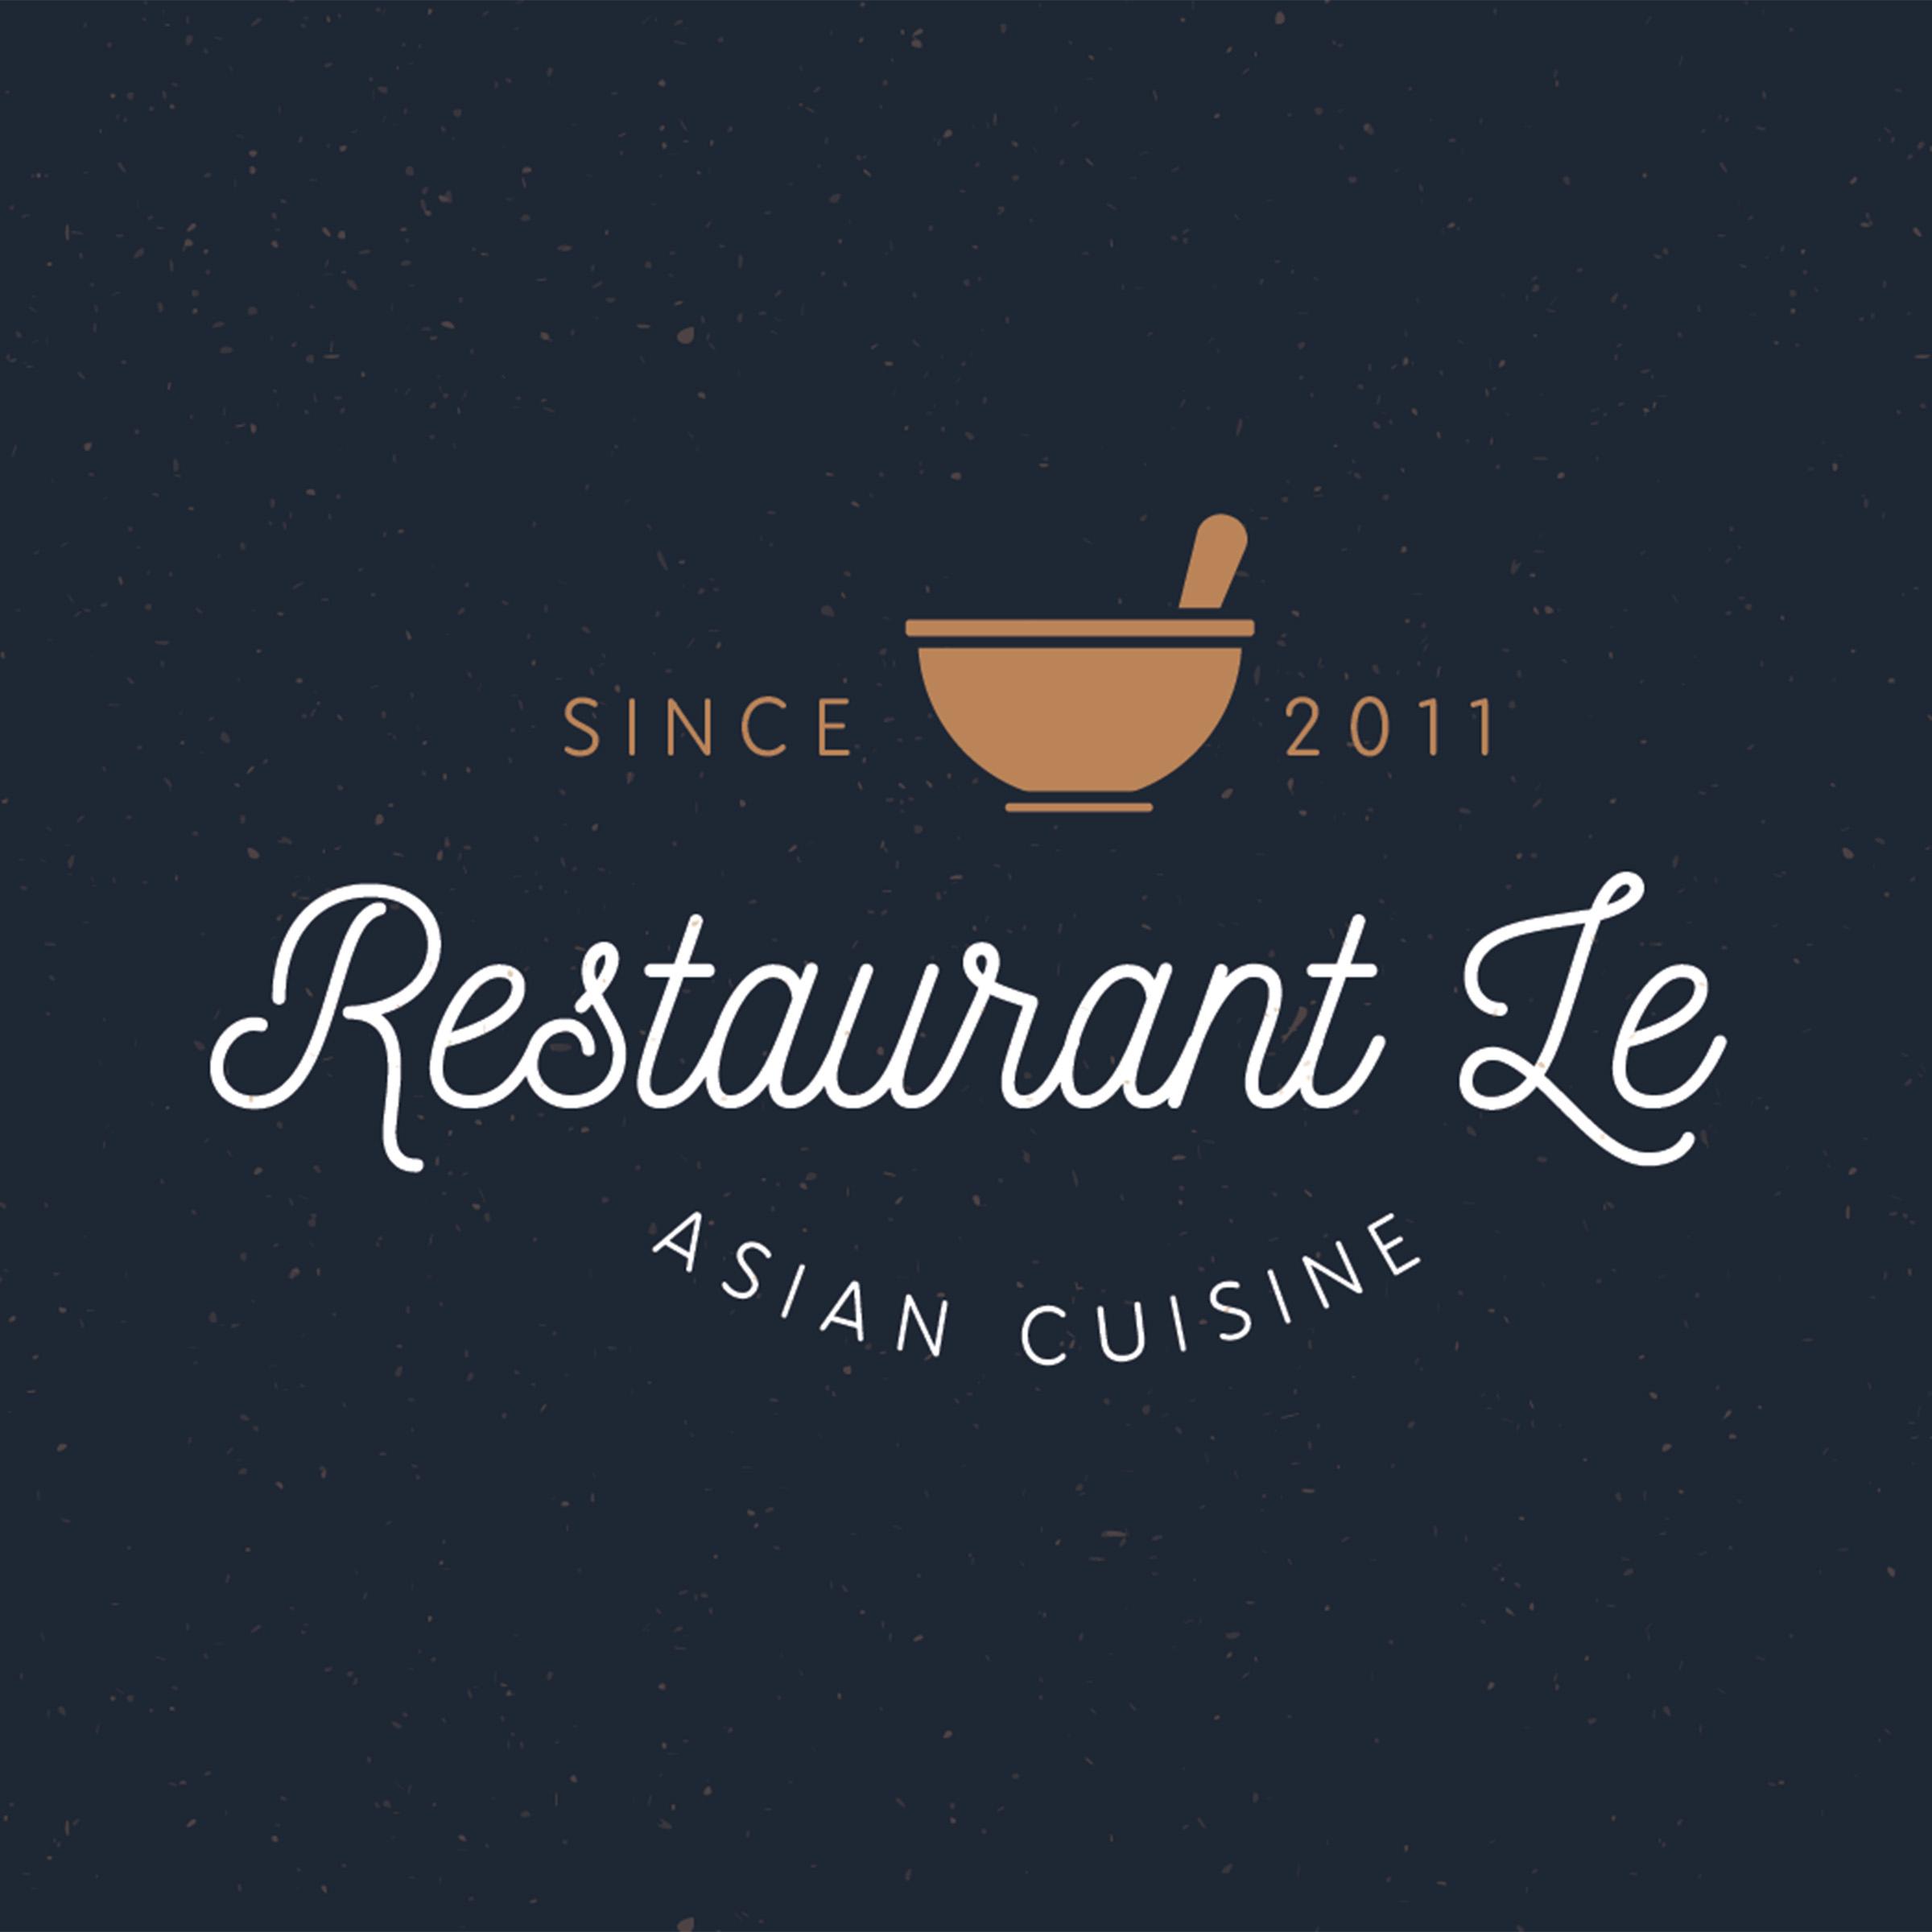 Restaurant LE logo